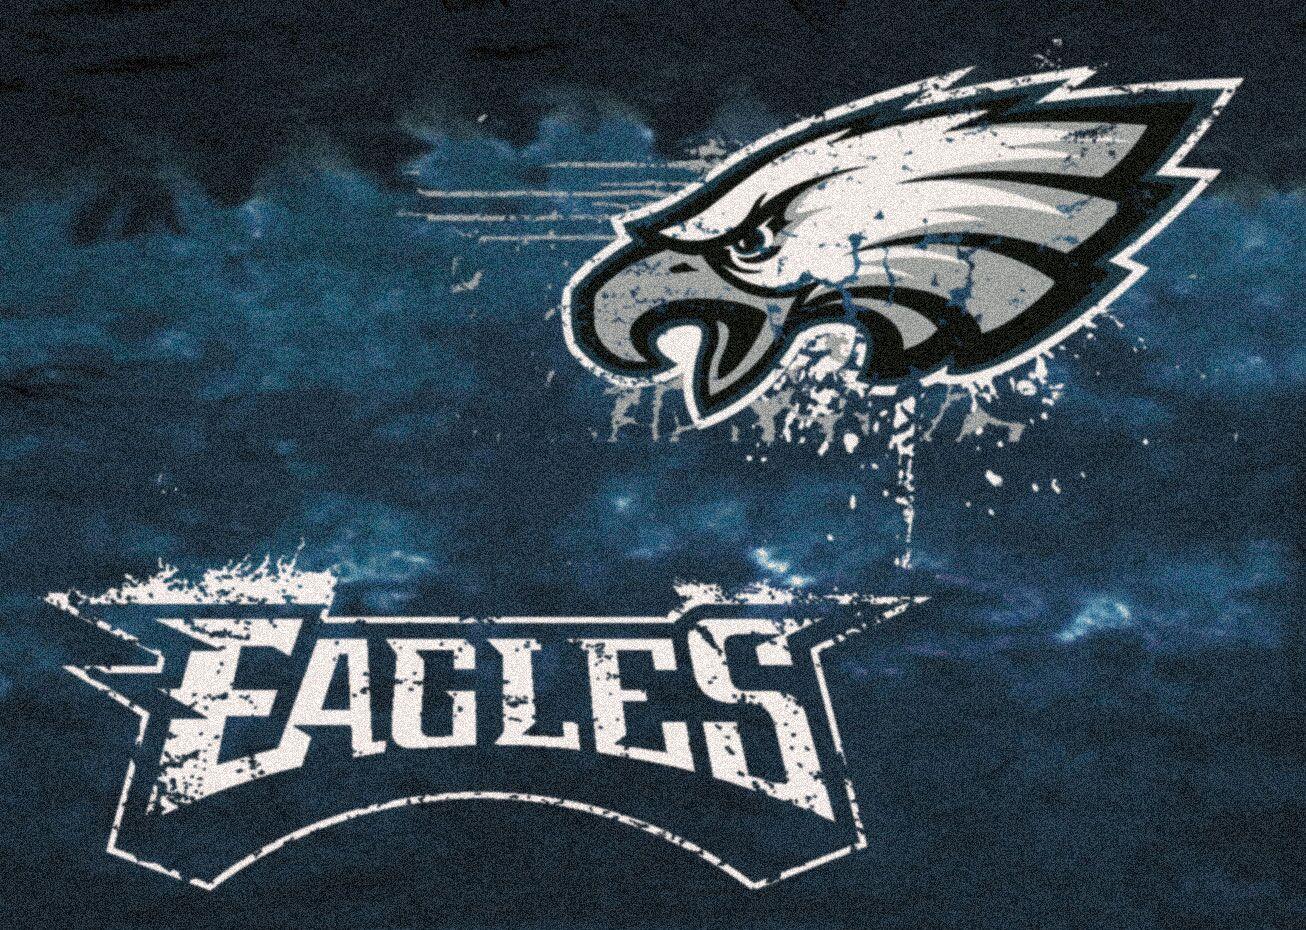 NFL Team Fade Novelty Rug NFL Team: Philadelphia Eagles